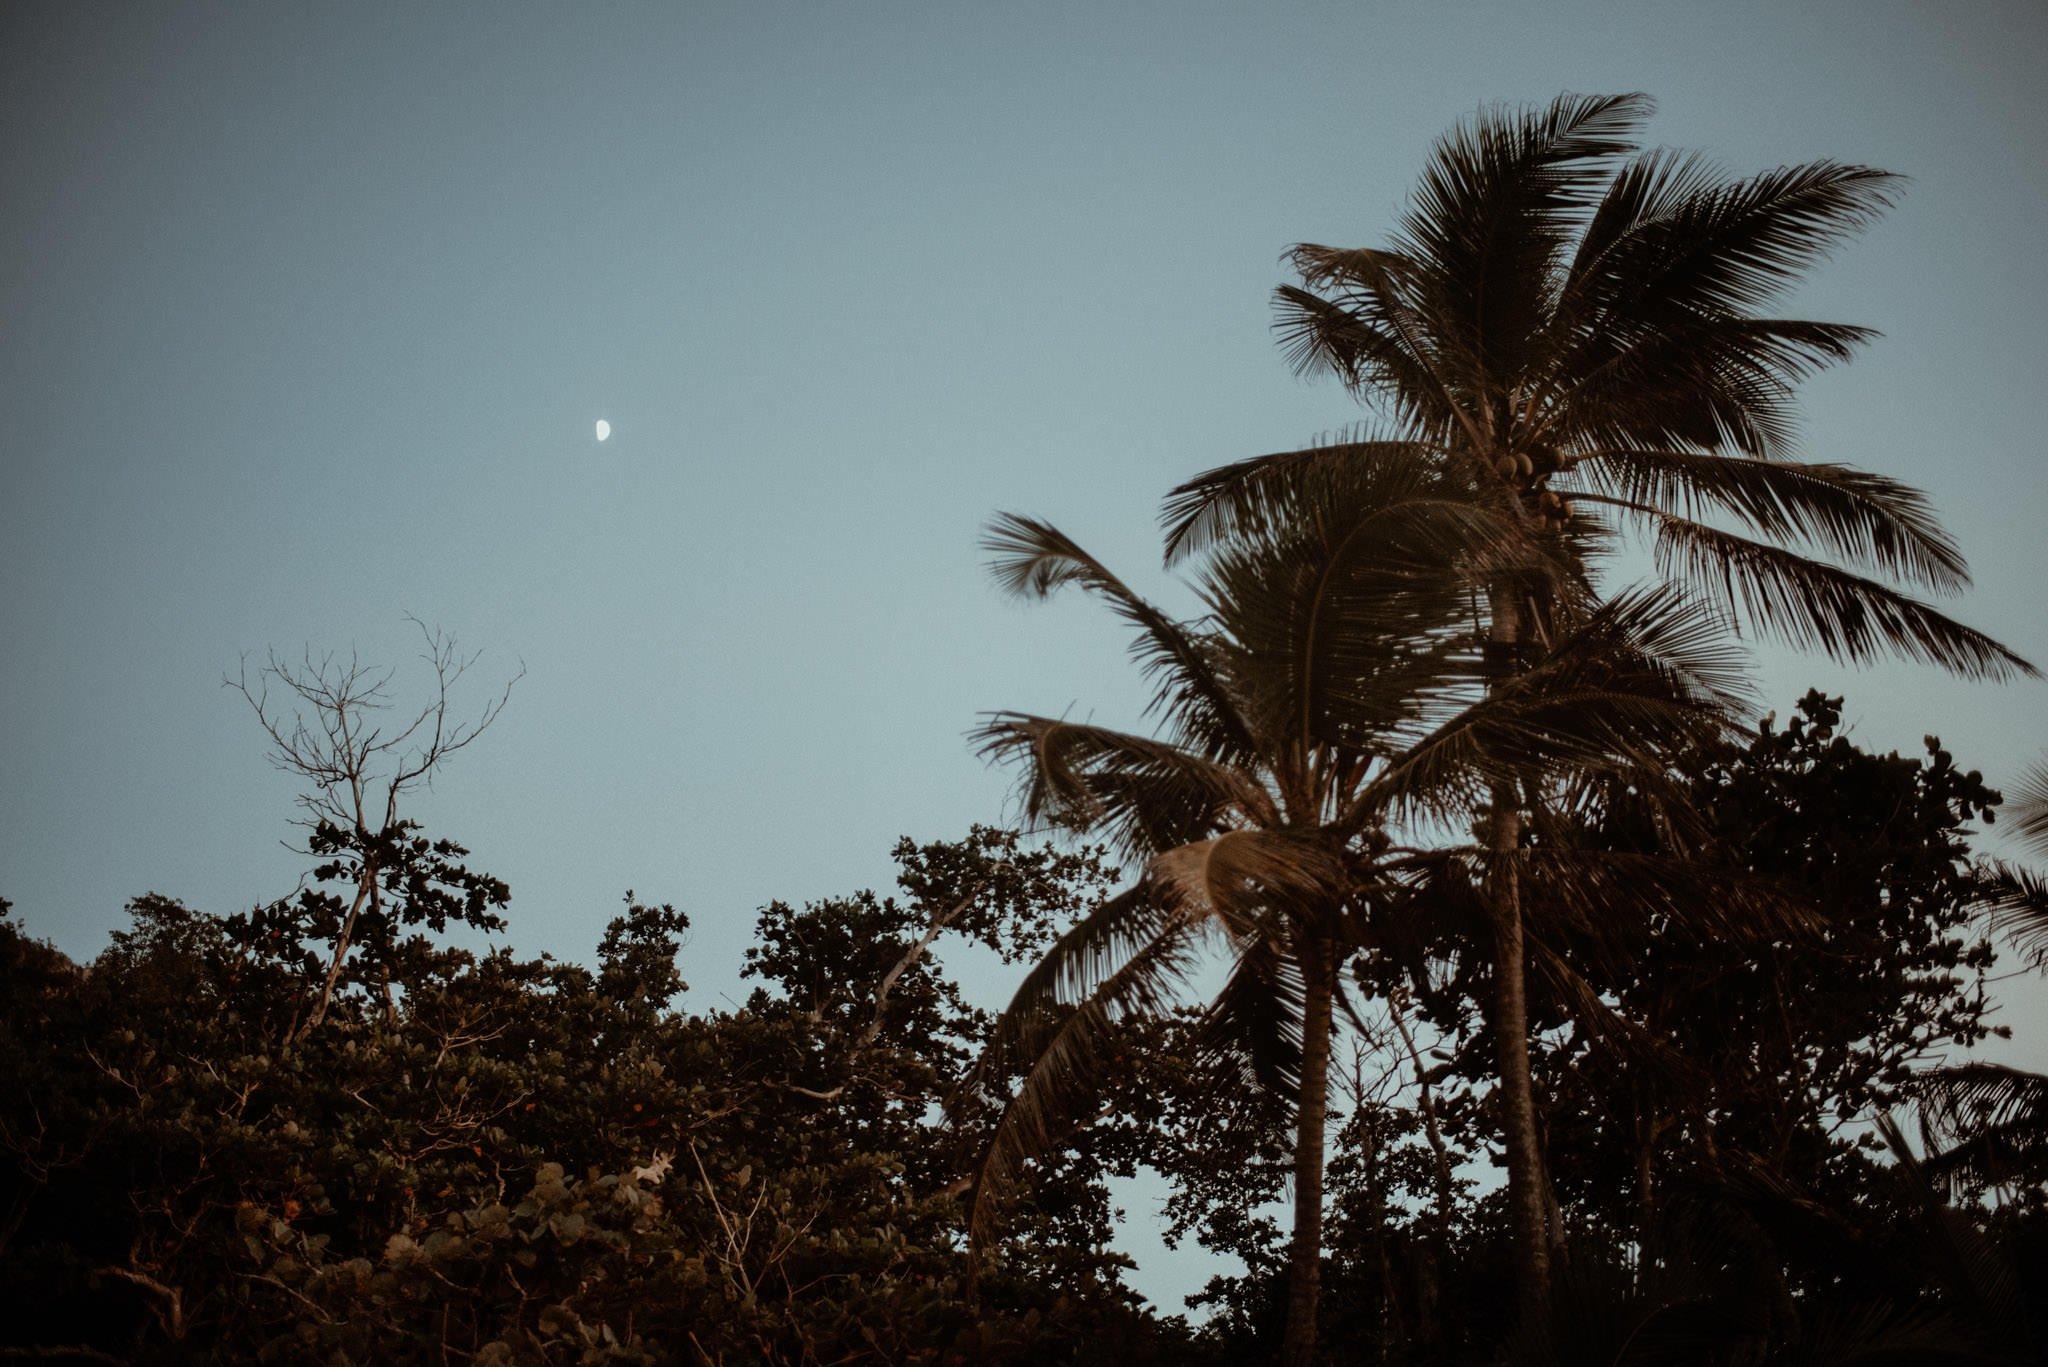 Puerto-Rico-Elopement_Lume-Photography-98.jpg